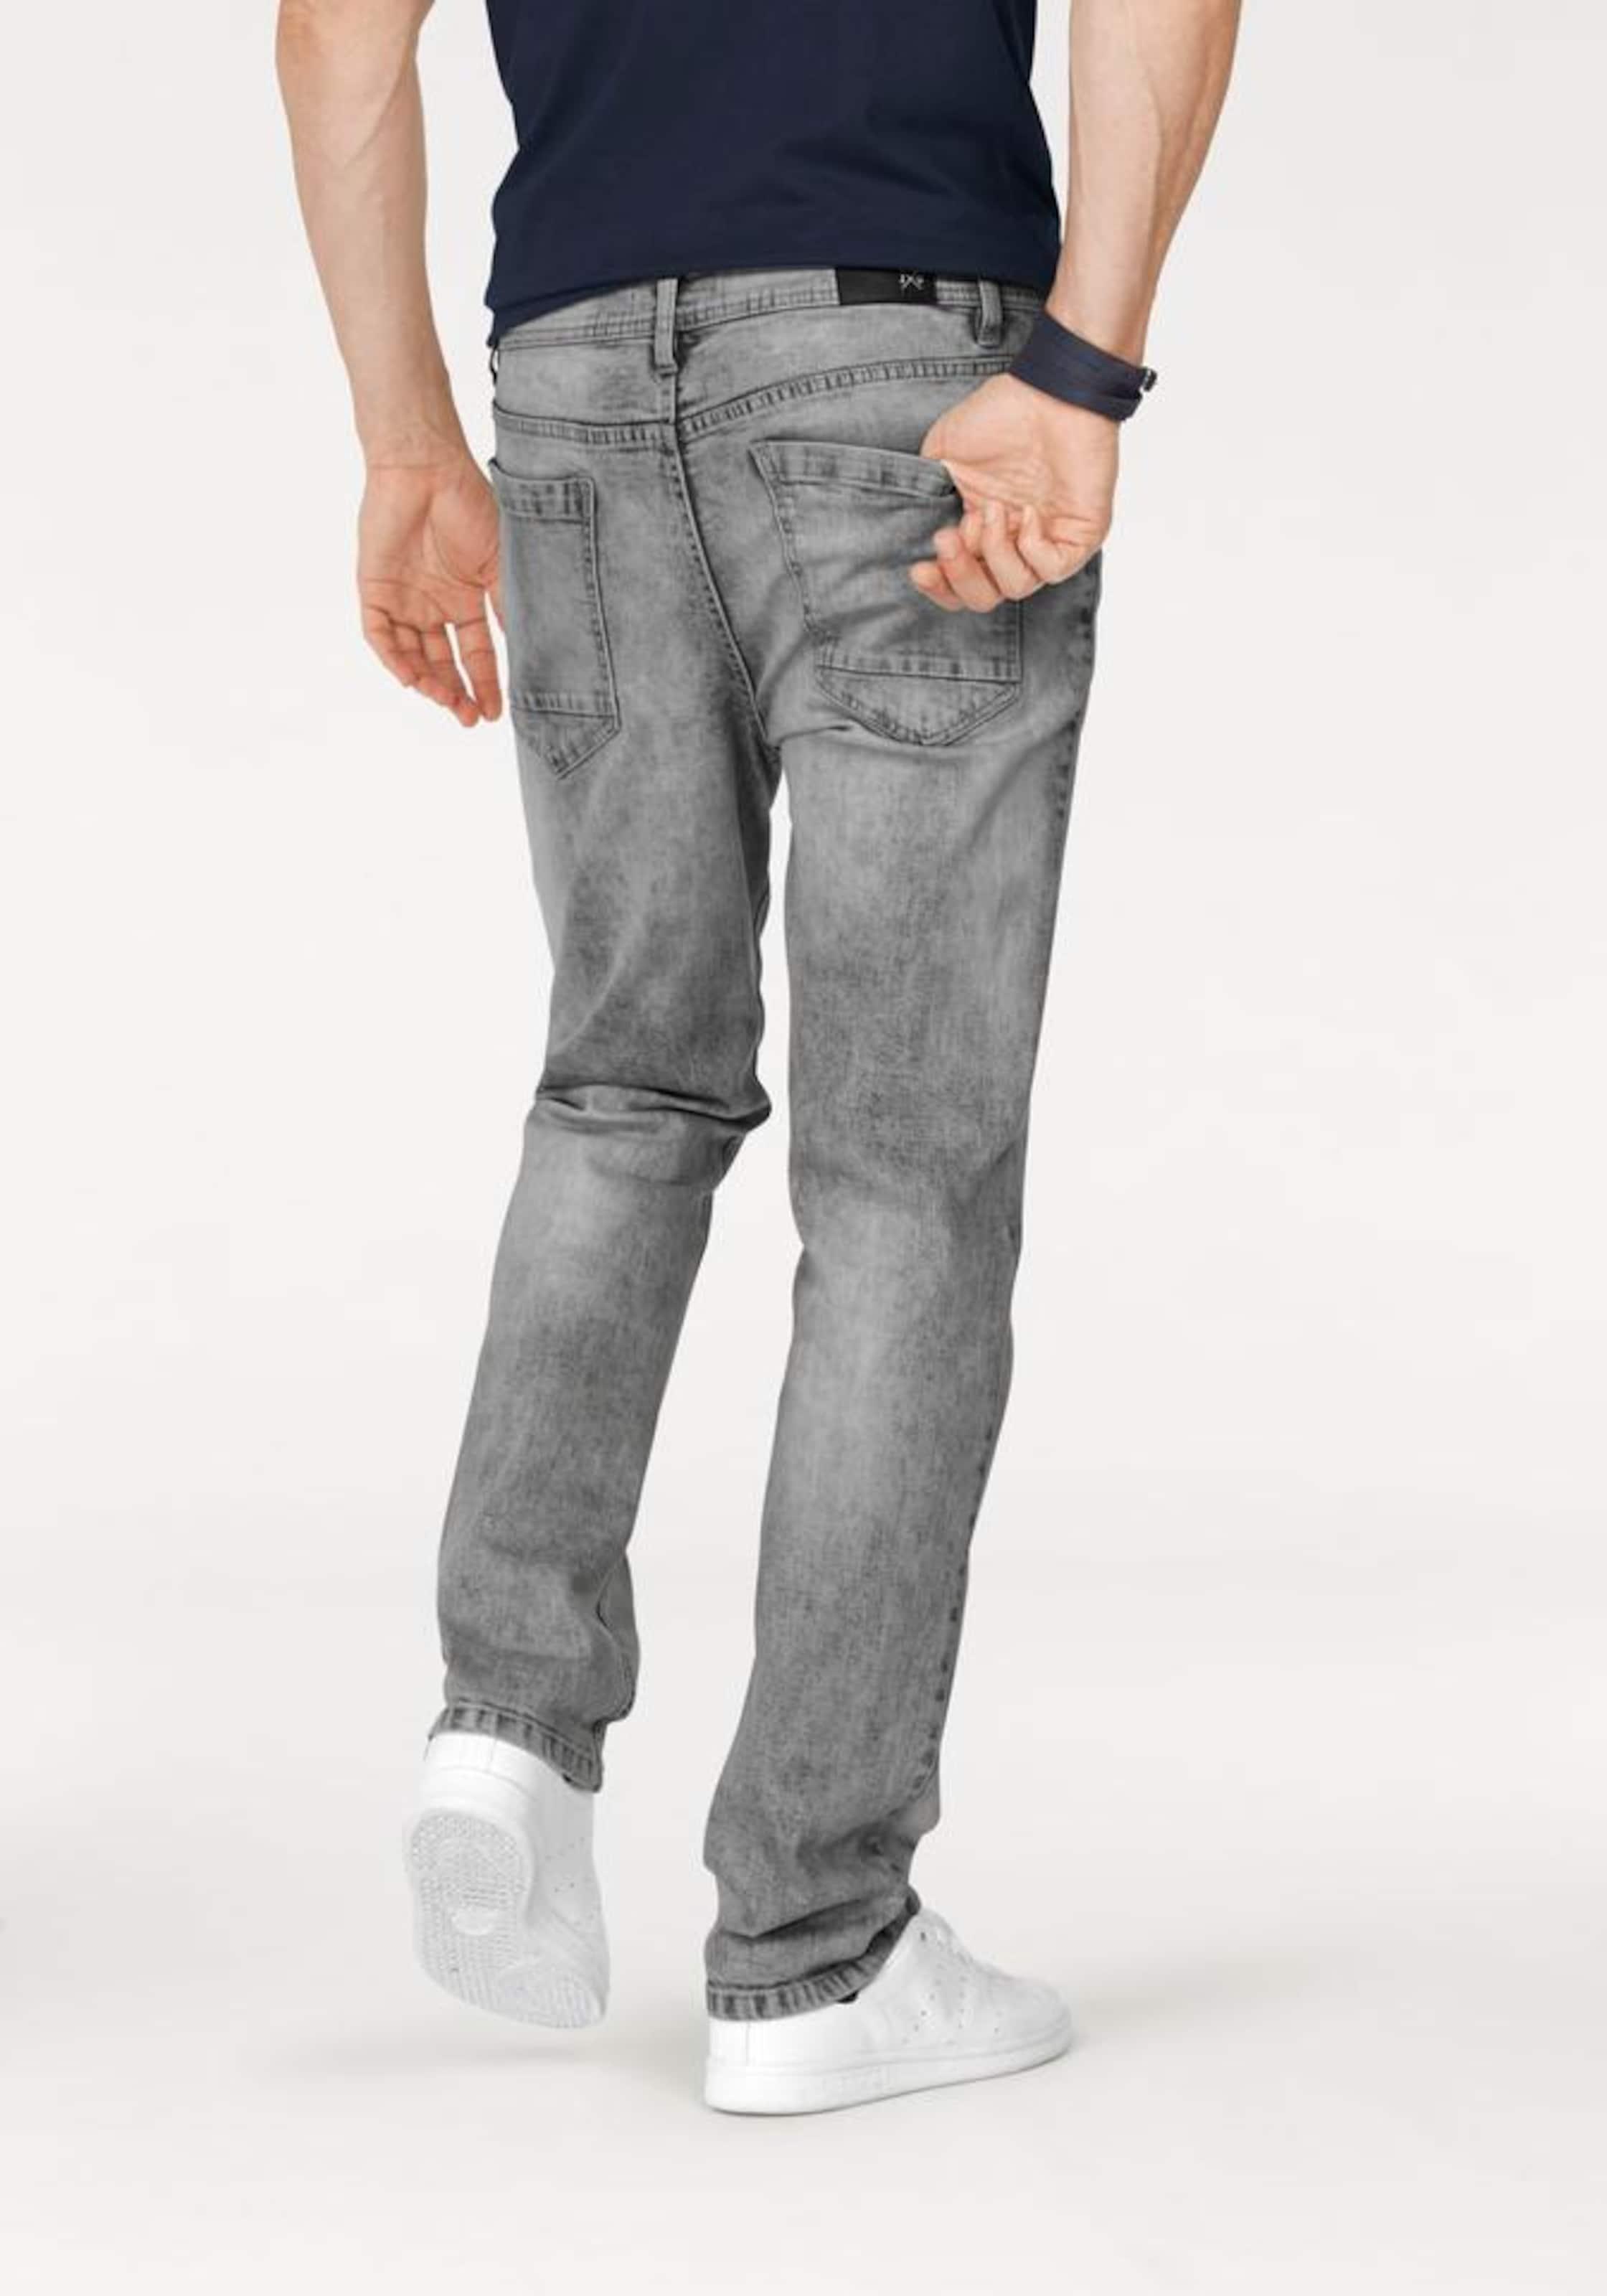 jeans Devin In Grau John Straight eWEHIDY29